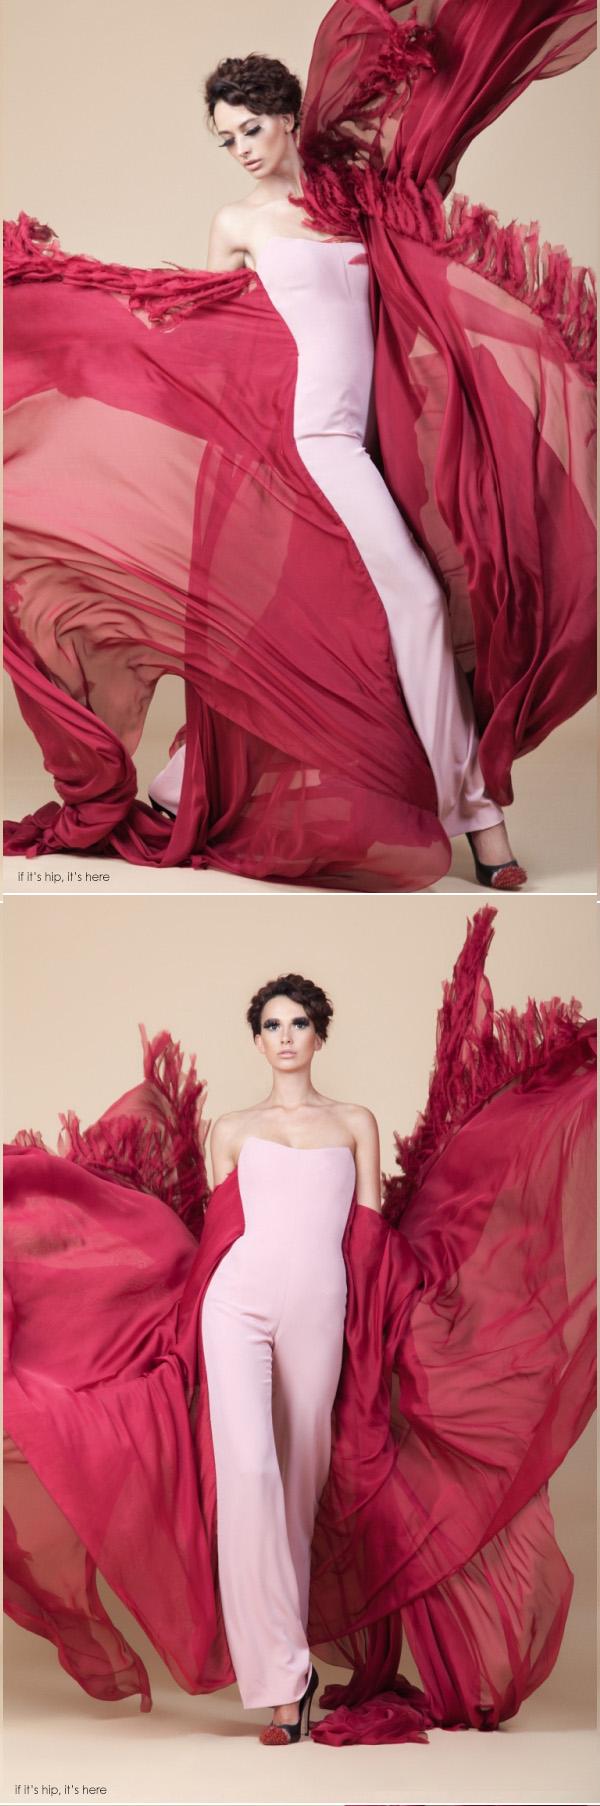 The Impressively Imaginative Couture of Designer Jean Louis Sabaji ...